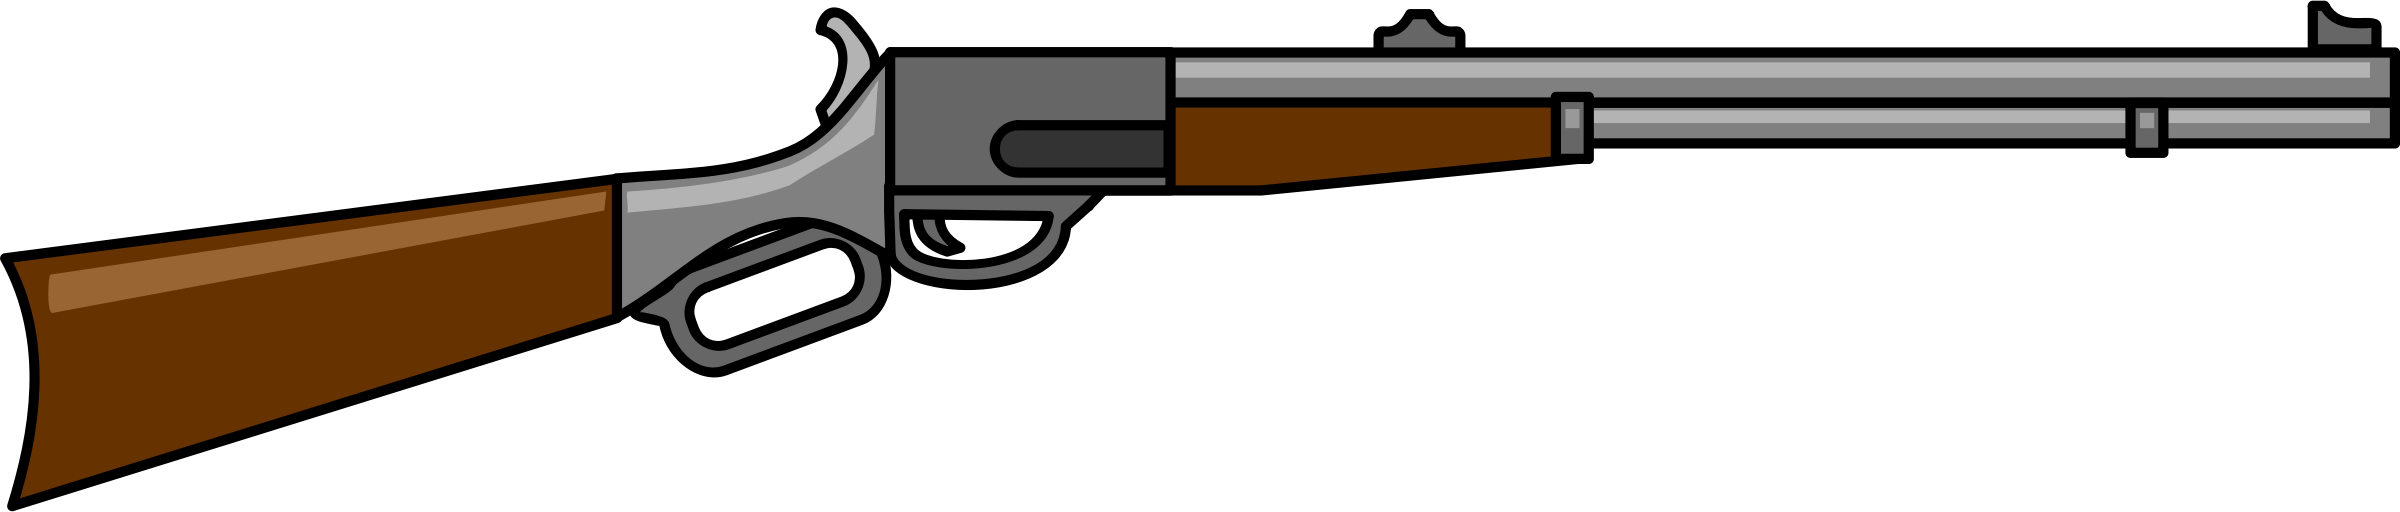 Cartoon Gun PNG - 161362